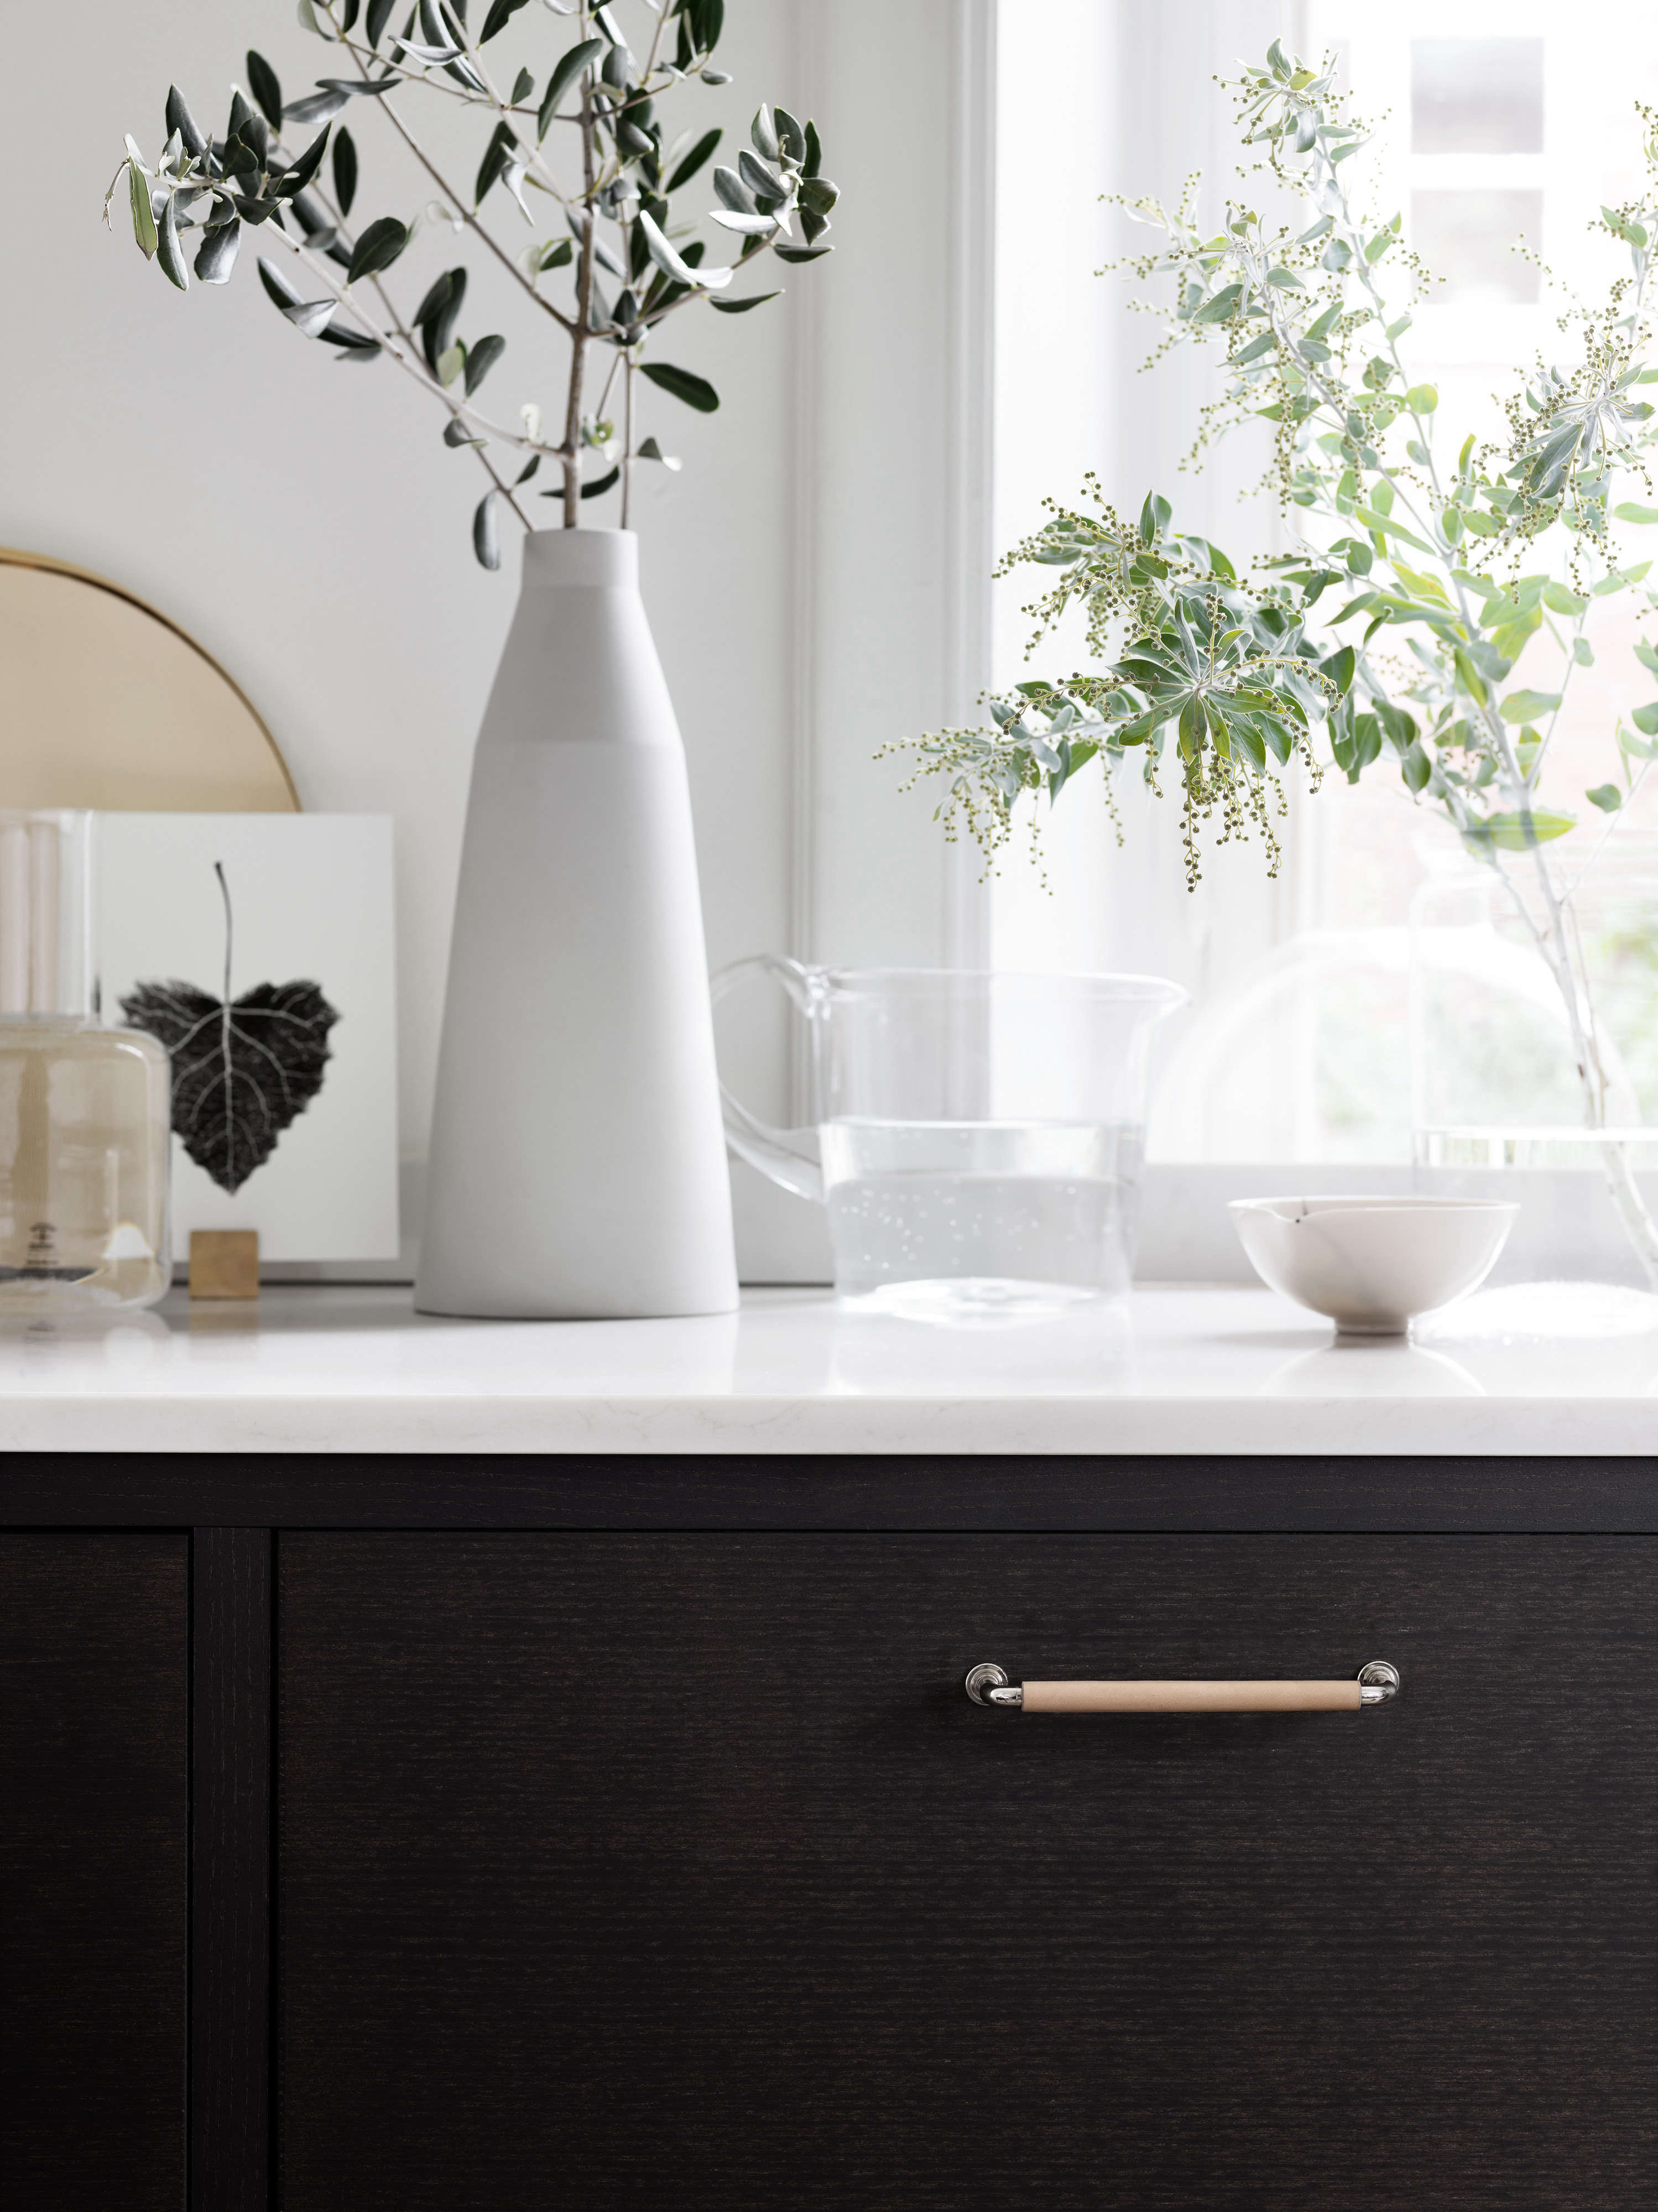 bistro kitchen in ash brown by ballingslov of sweden remodelista 9 12